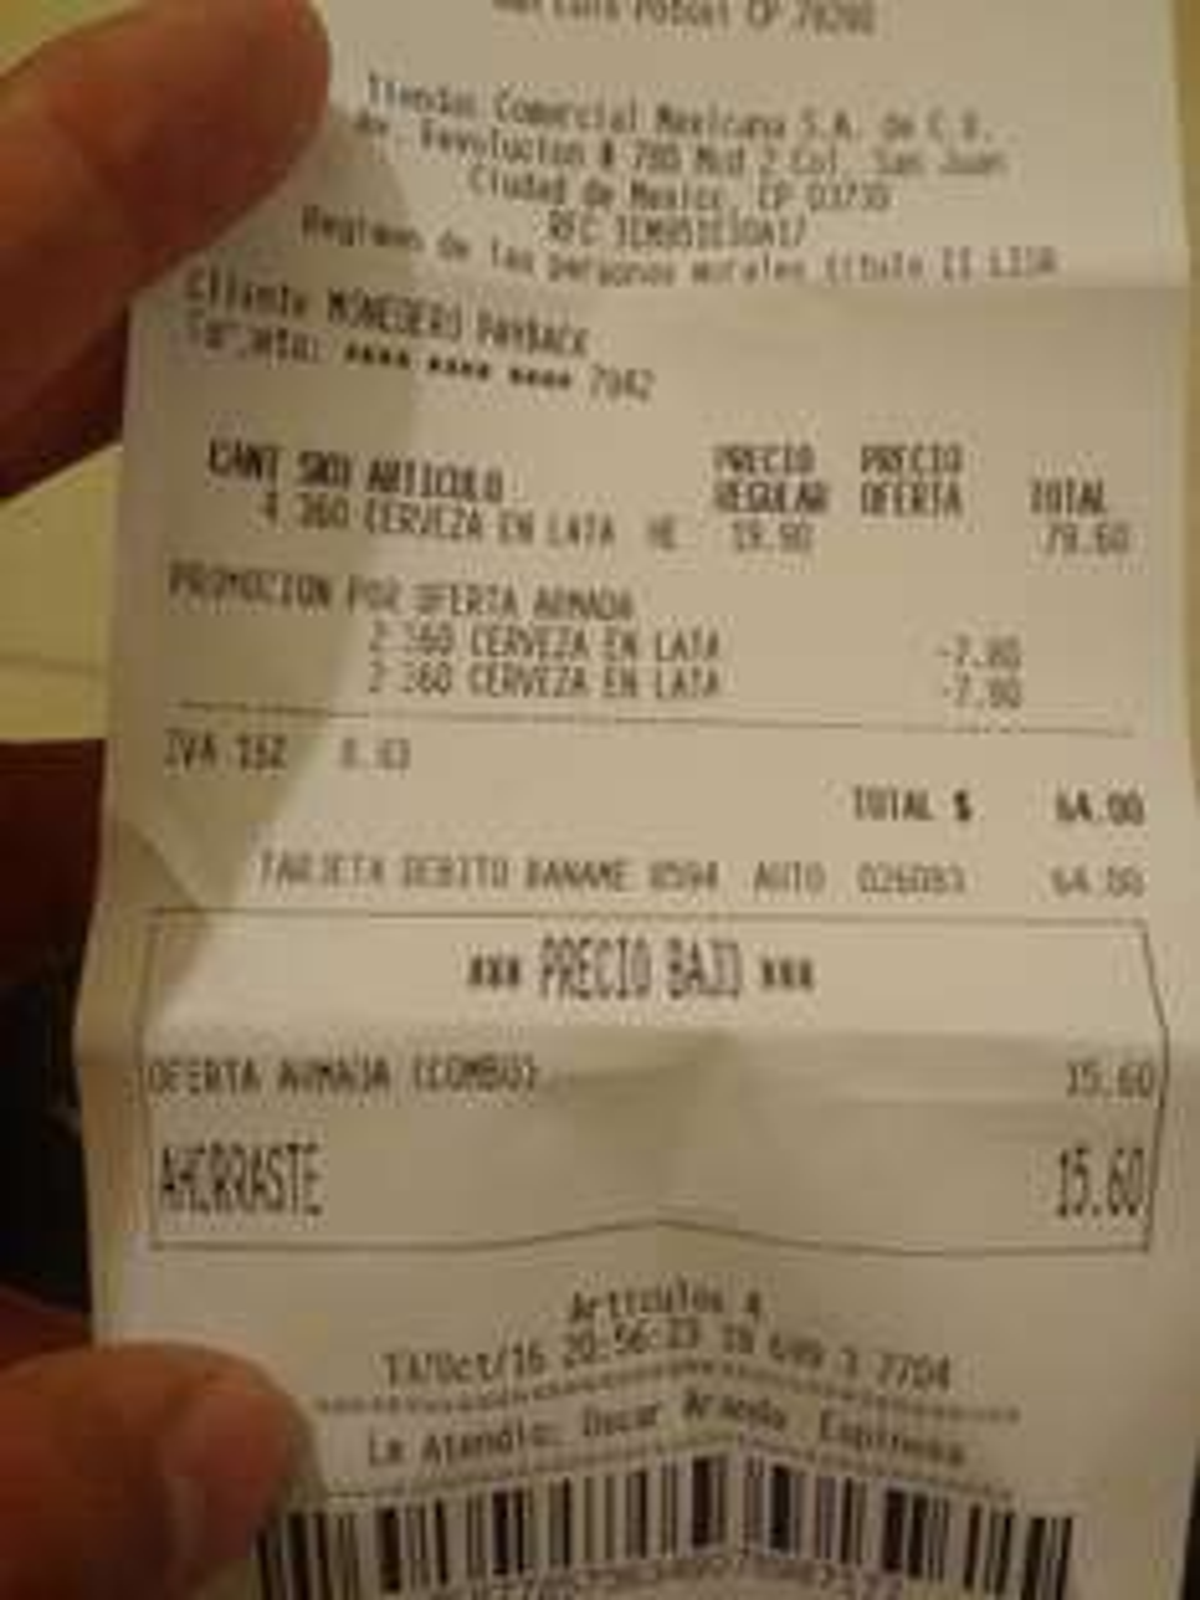 Comercial Mexicana plaza fiesta SLP: 2 cervezas Heineken lata 473ml x $32